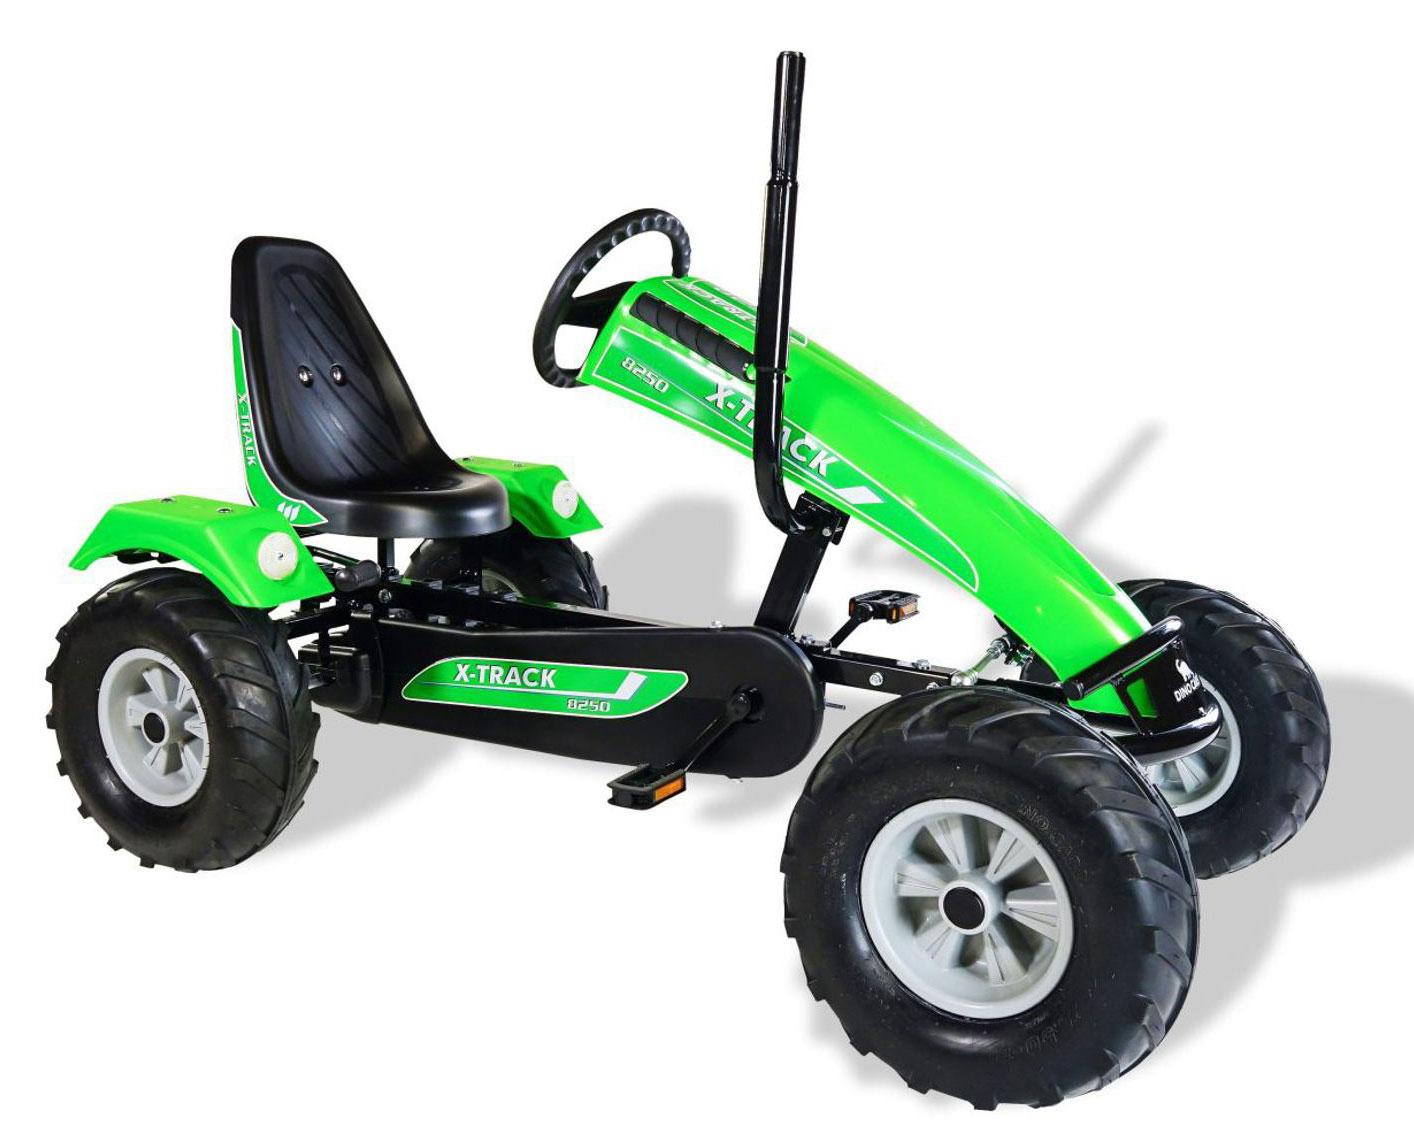 Gokart / Pedal-Gokart Track BF1 grün DINO CARS Bild 1